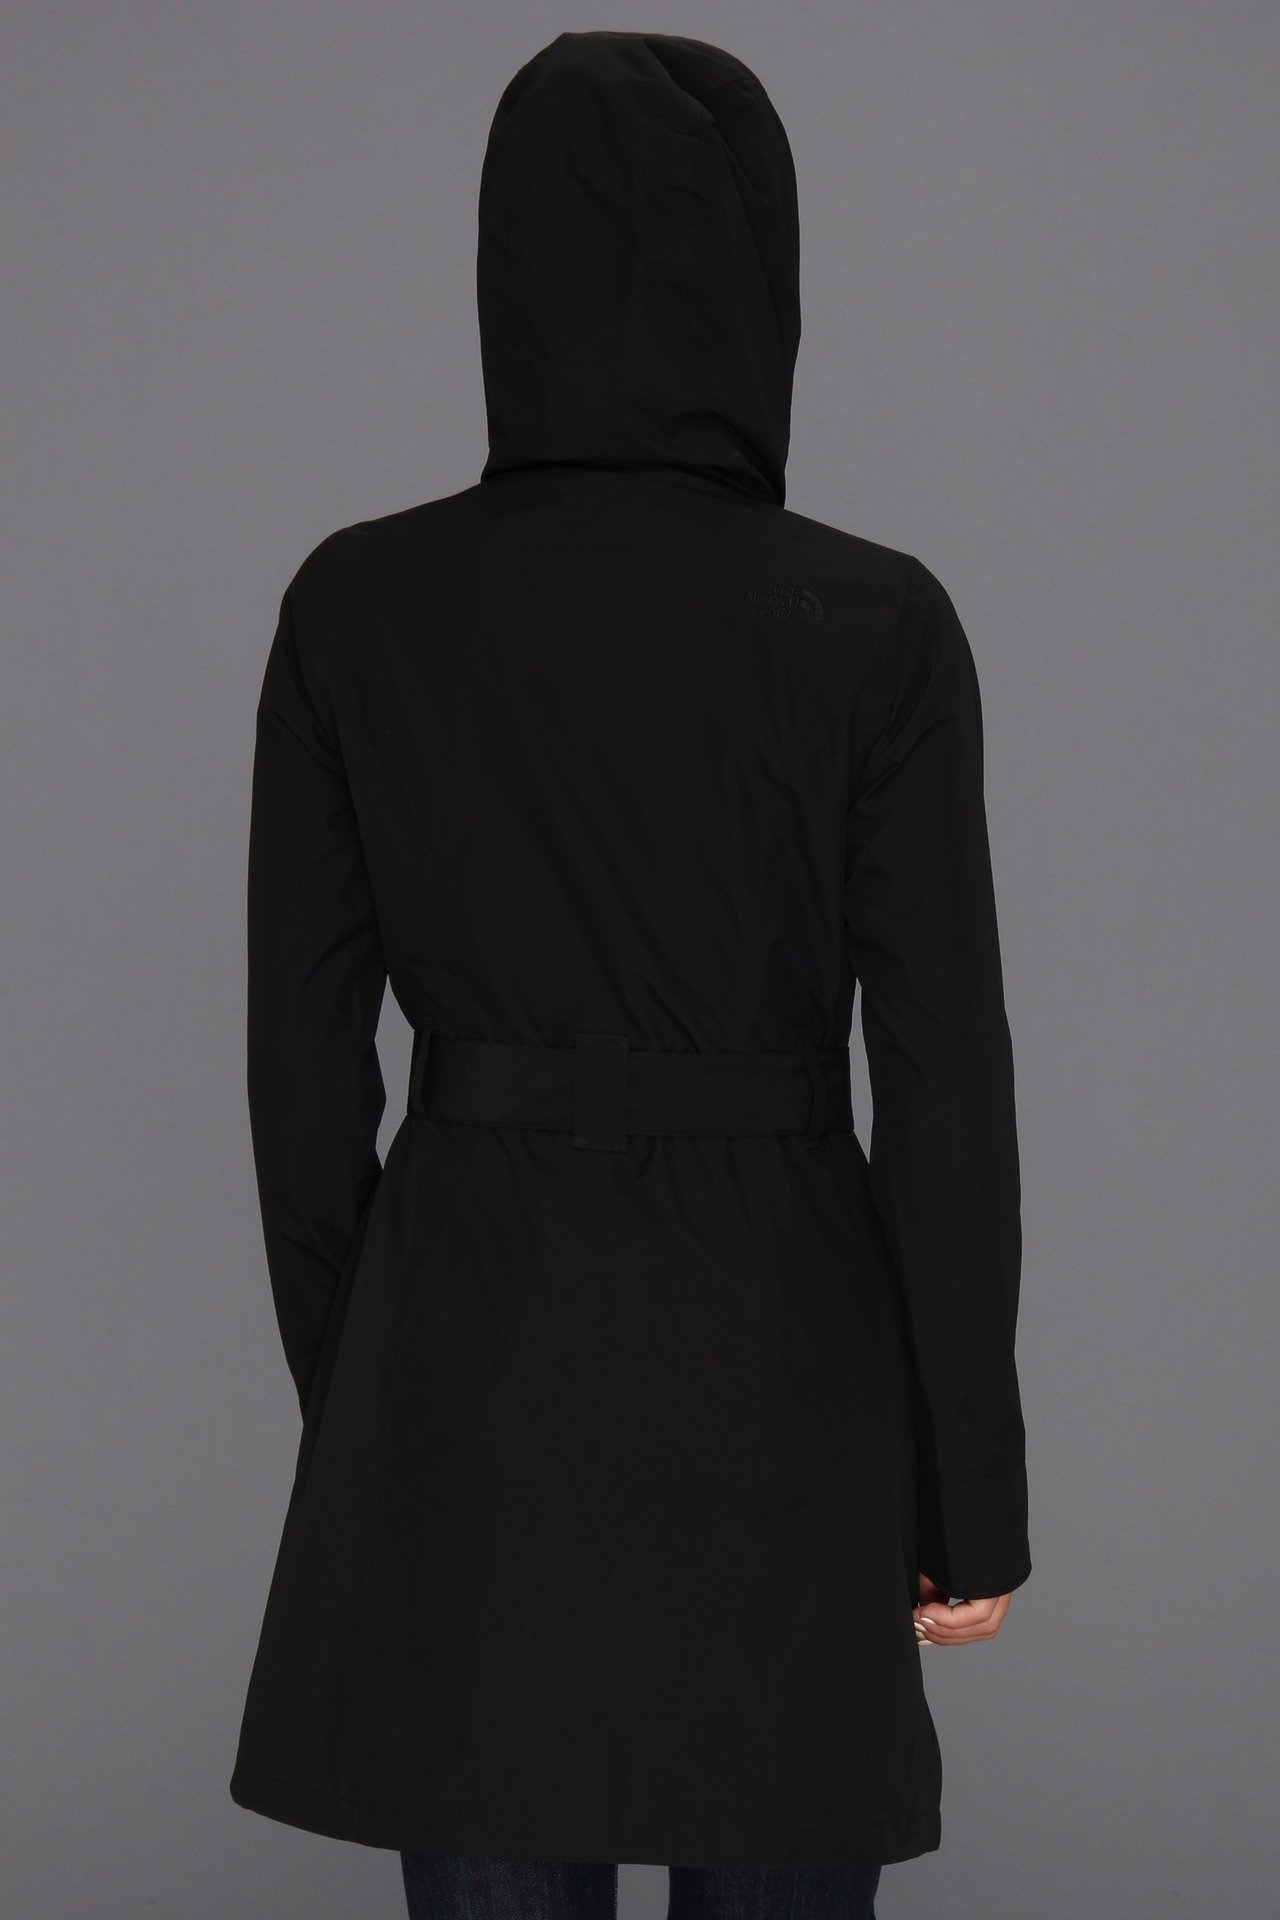 The North Face Womens Stella Grace Jacket image https://media.buyr.com/VC7yarTOFjYMXA_3sO1B5g-xHrVYcldd4nmzmQ-lGi9aA.jpg1